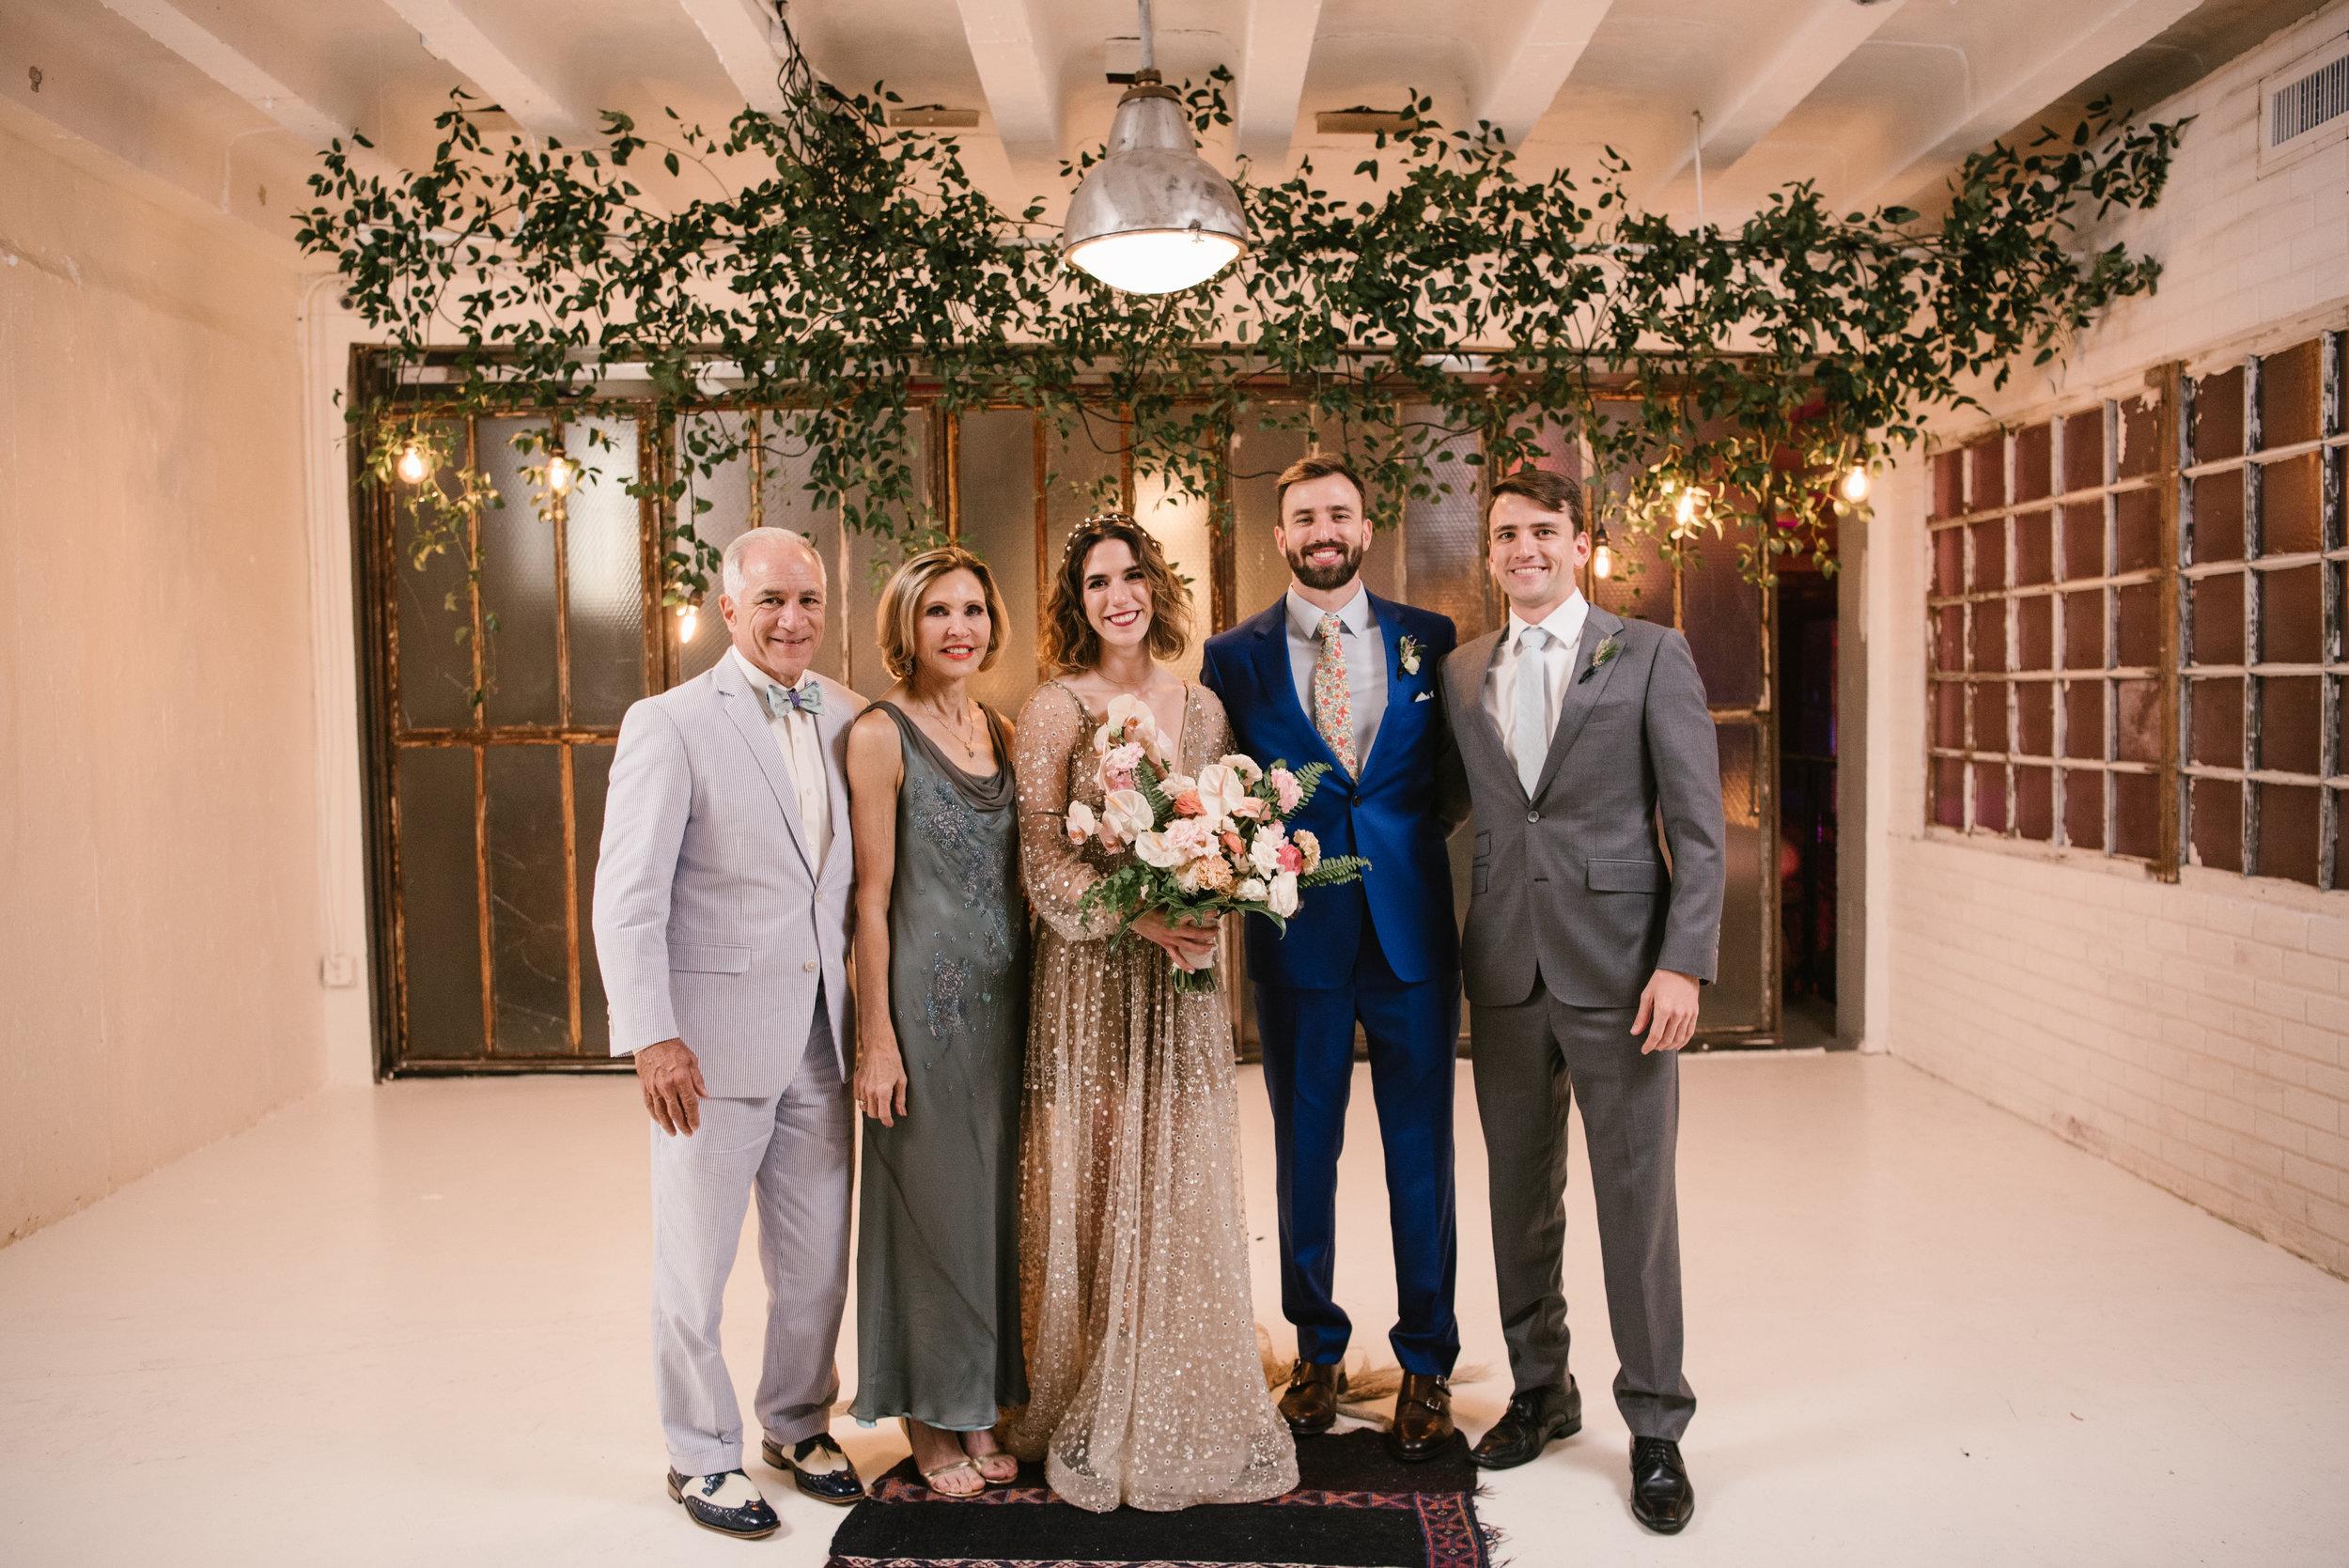 stephanie-bobby-ace-prop-house-miami-florida-wedding-1099.jpg